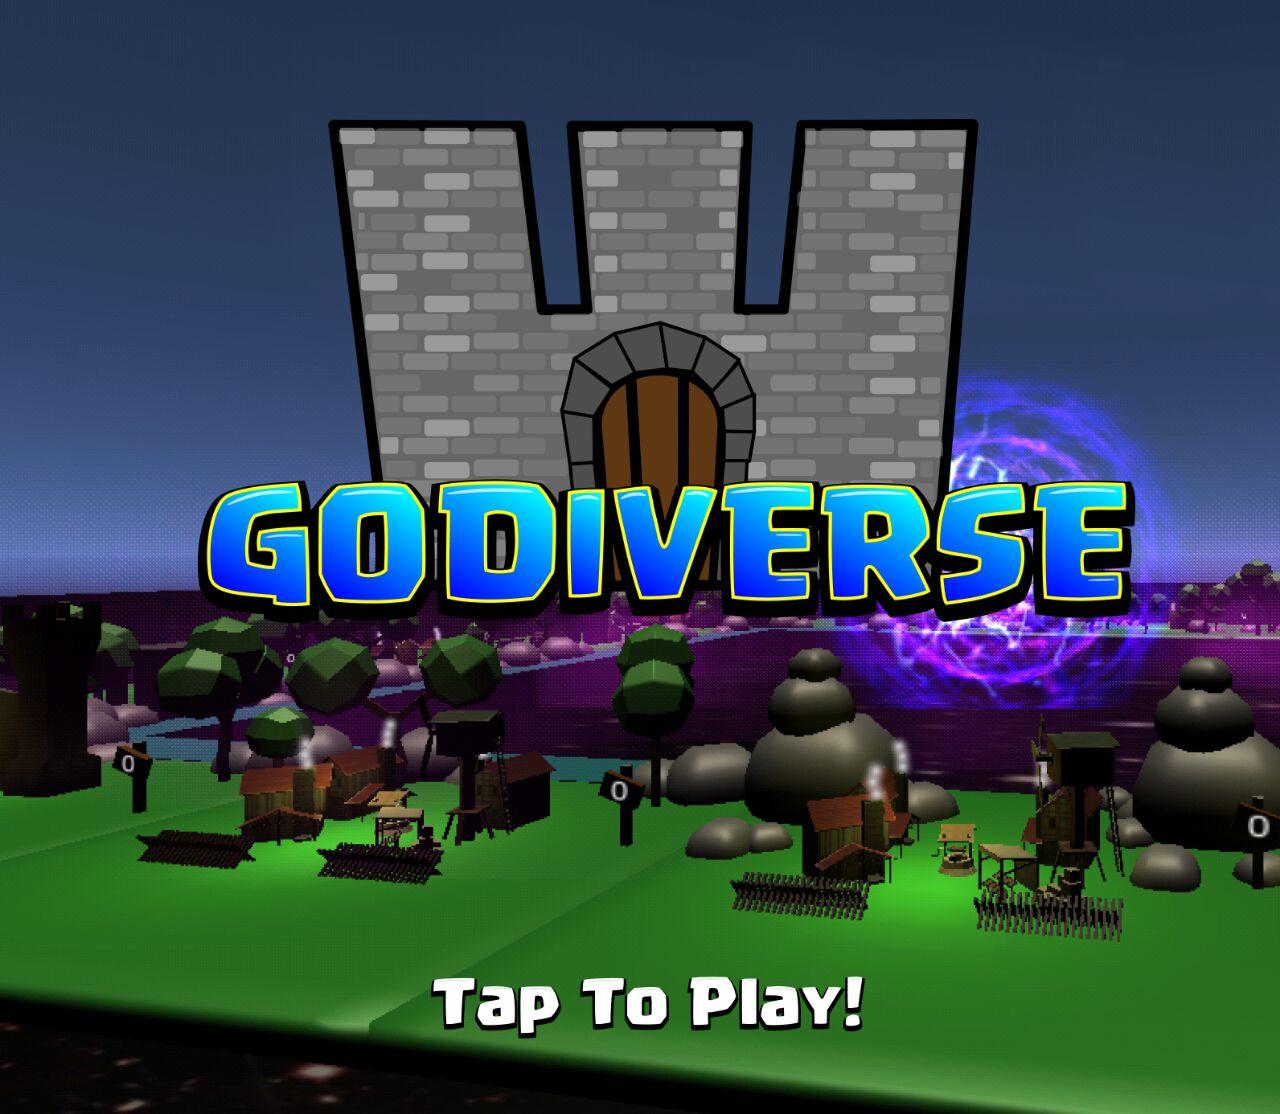 Godiverse